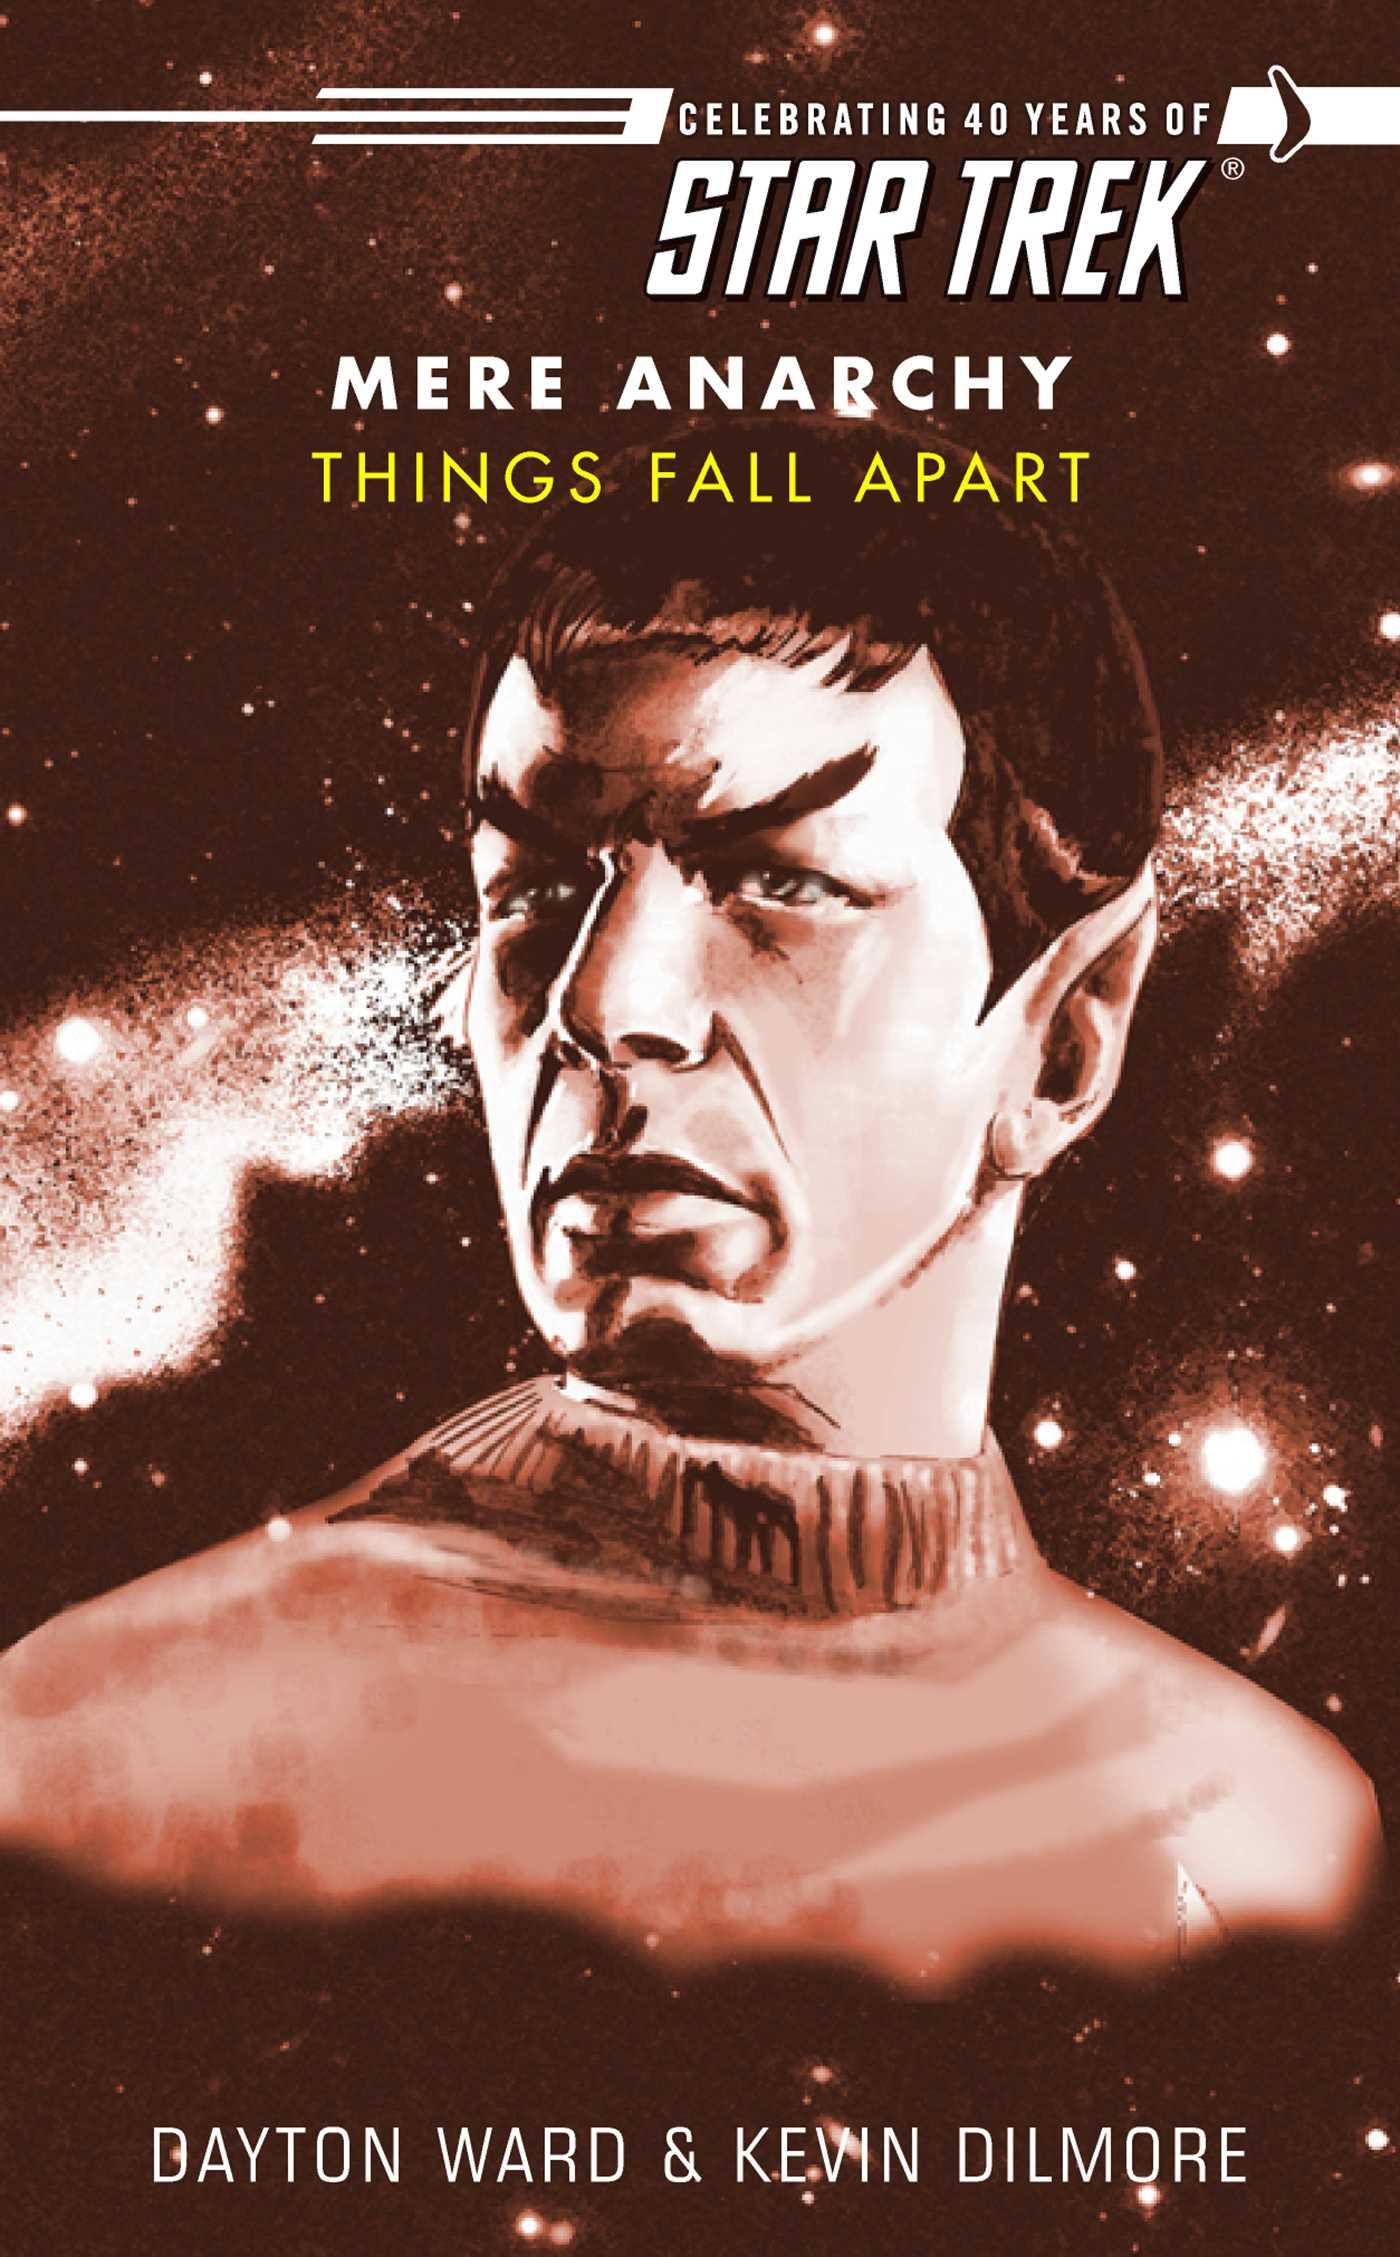 Star trek things fall apart 9781416534372 hr